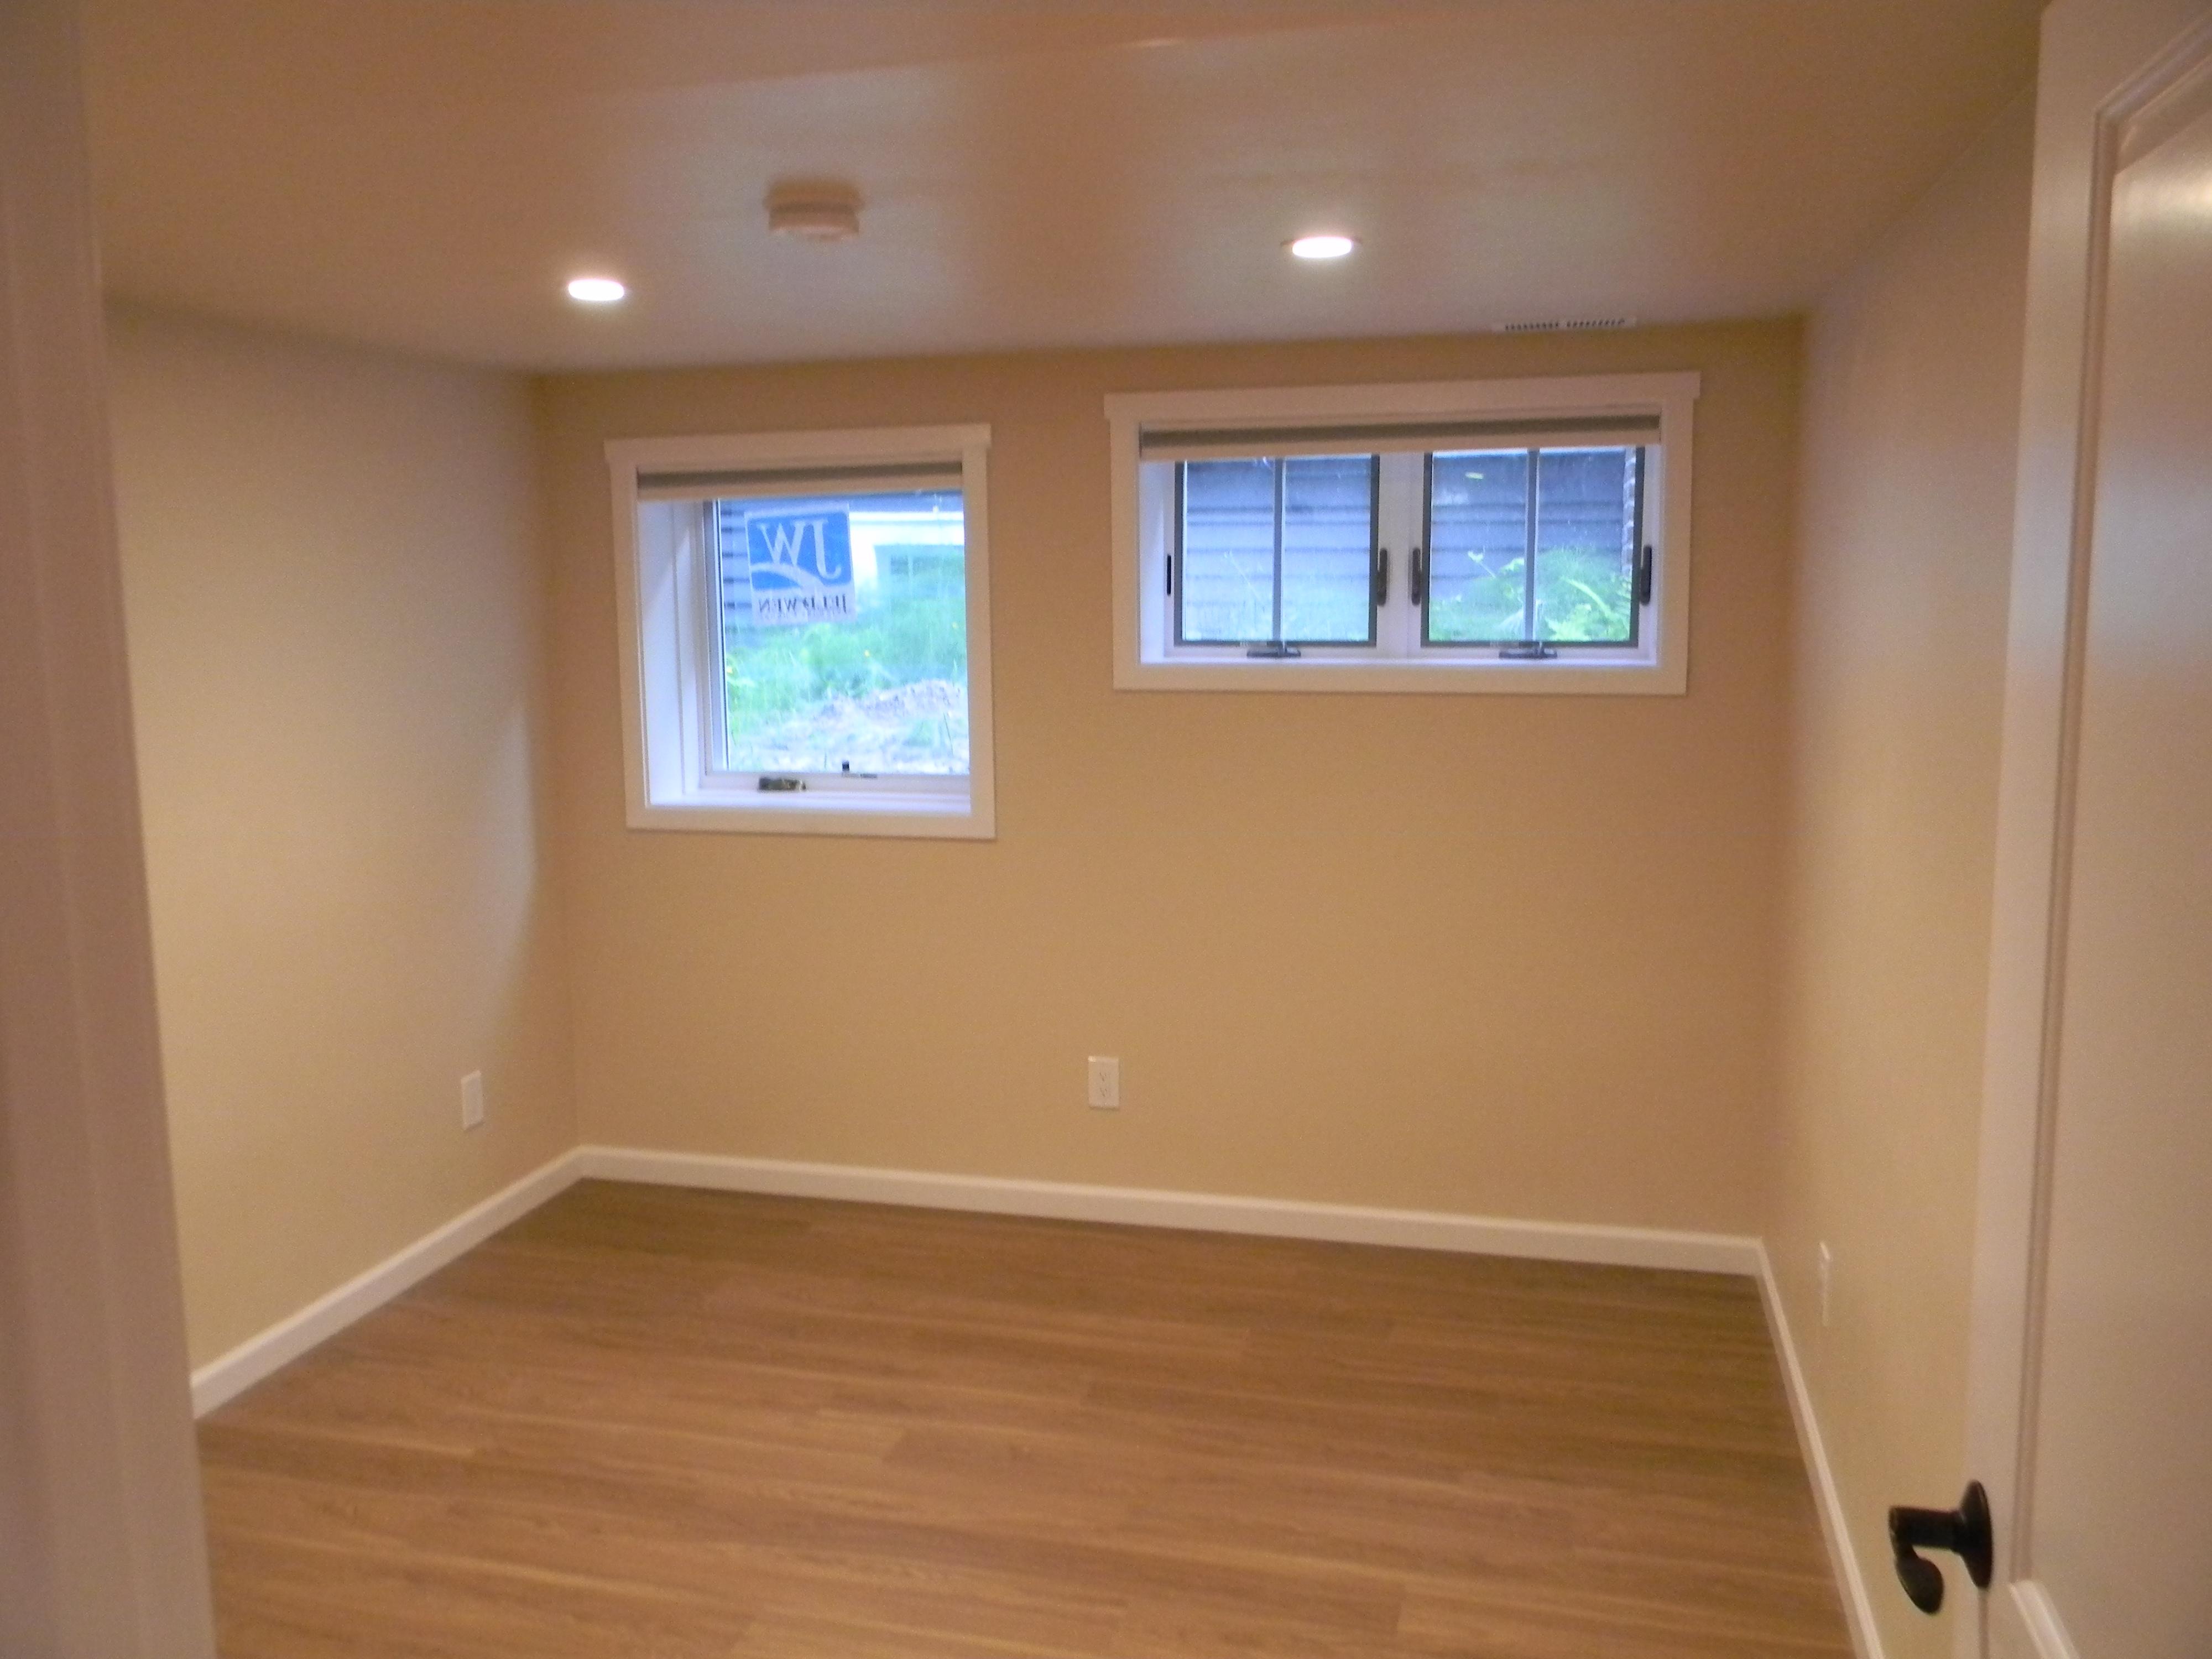 Ken Baune Homes and Remodel image 8